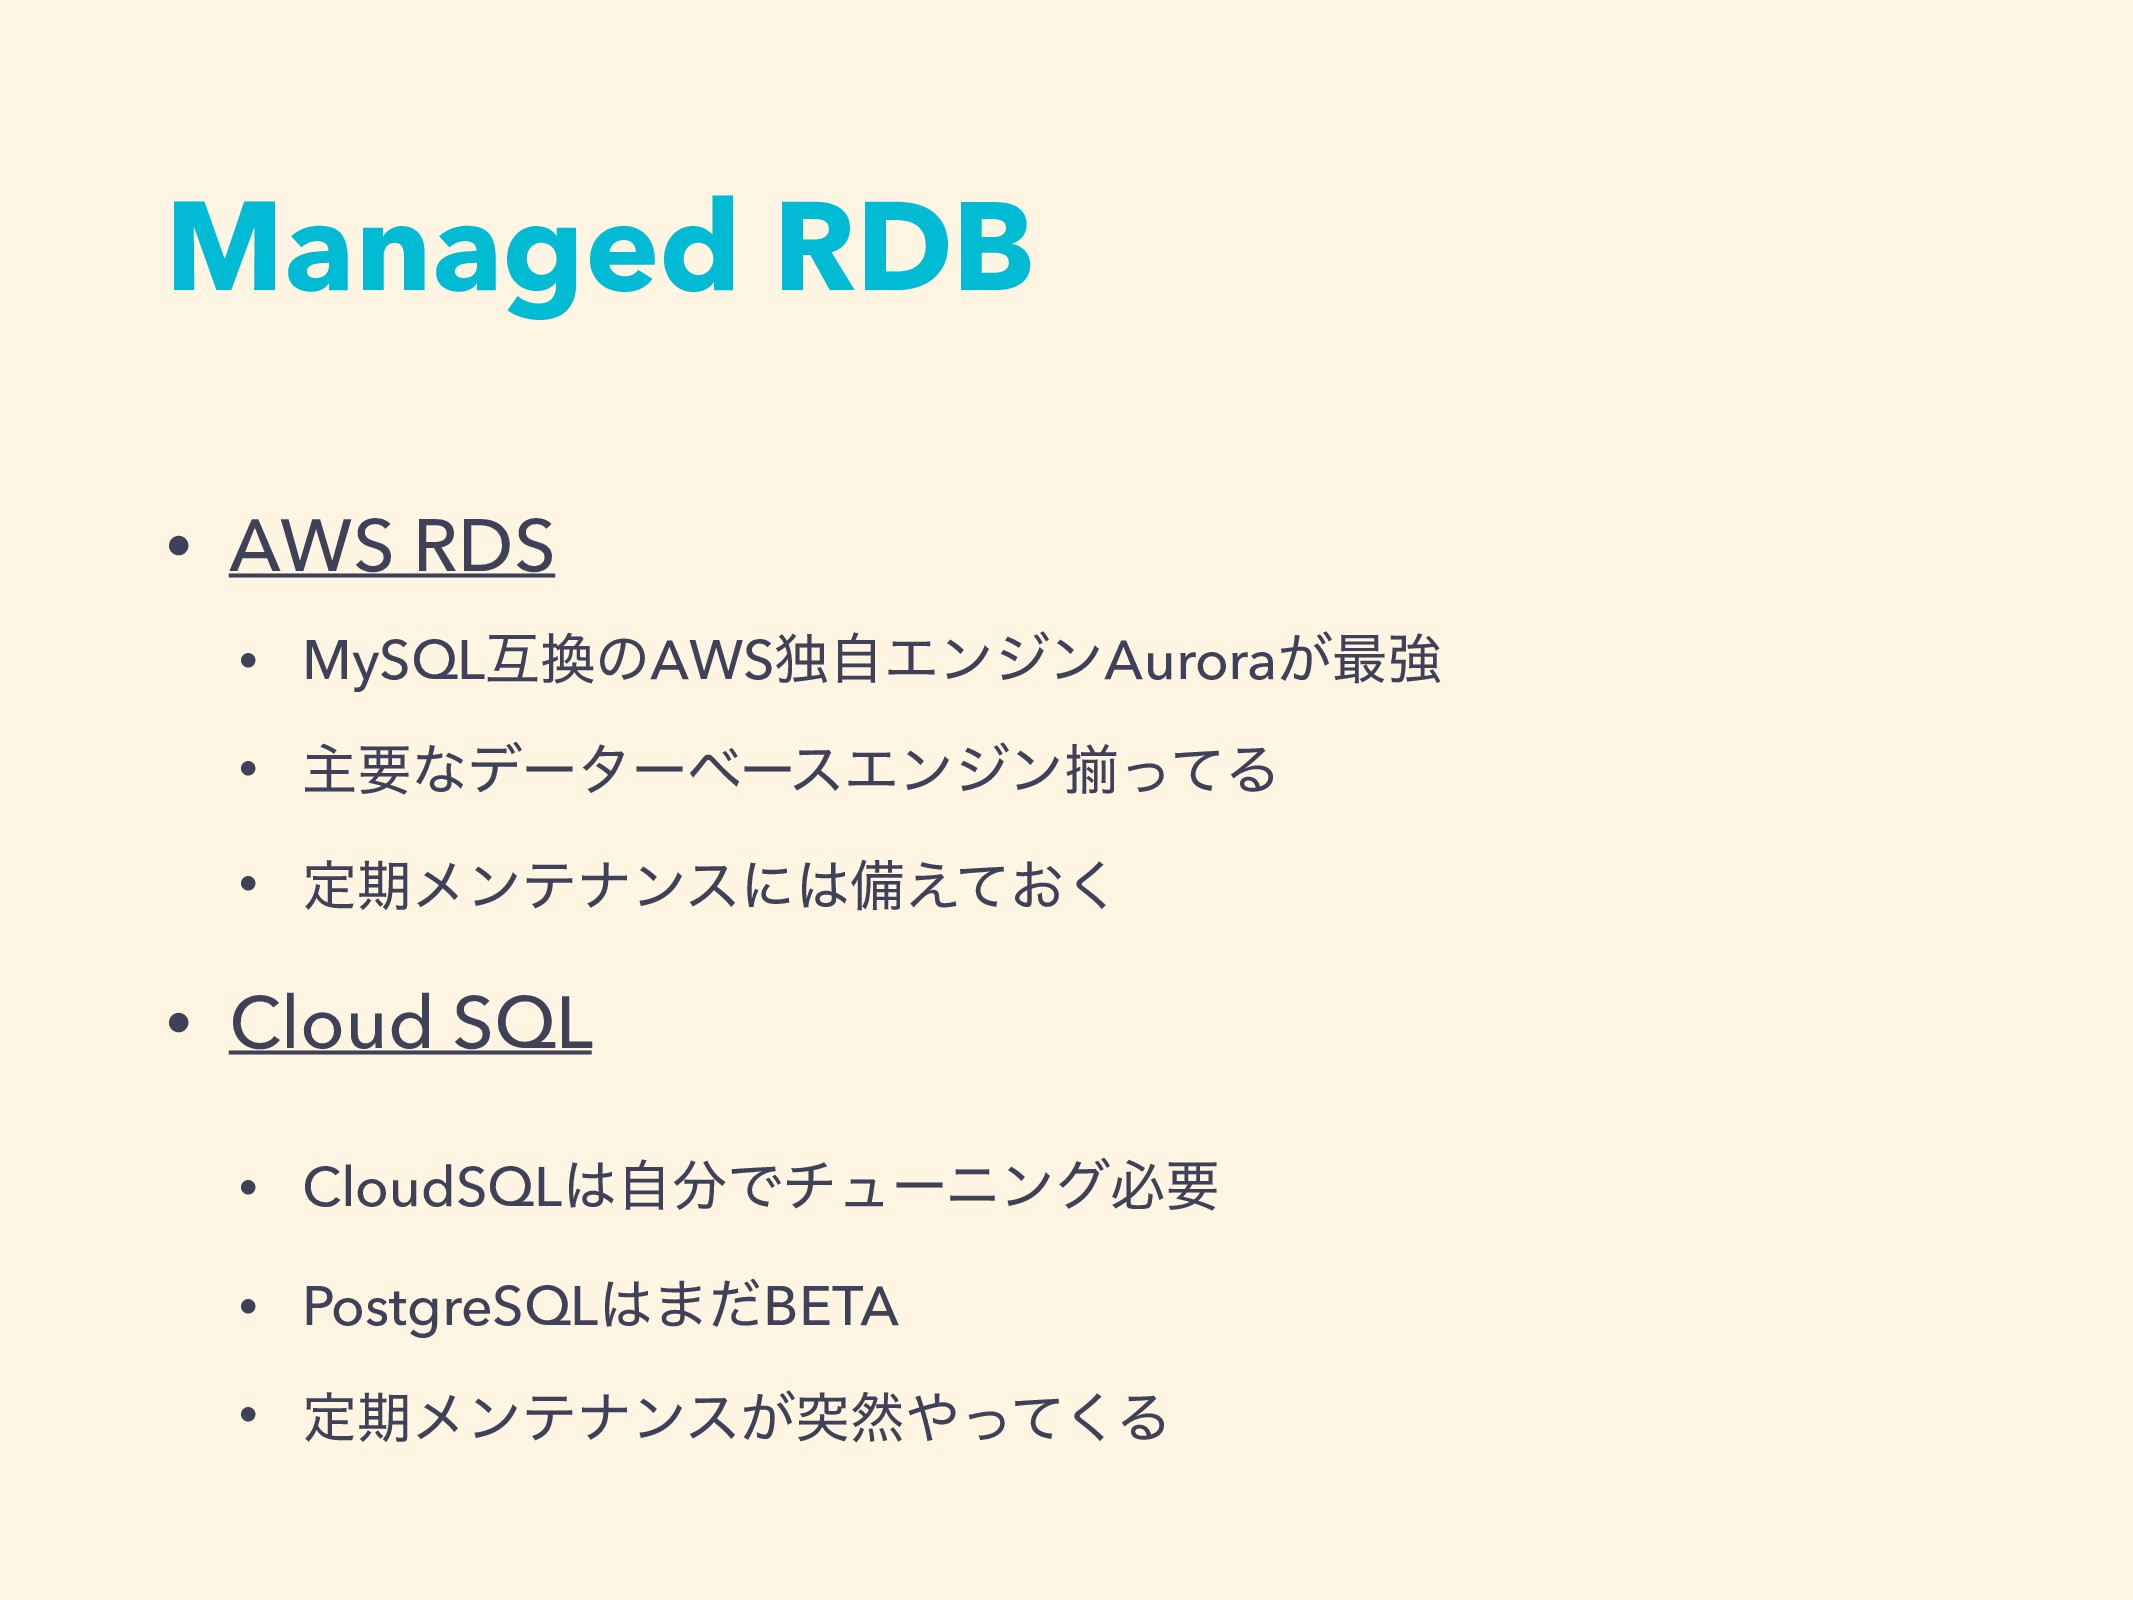 Managed RDB • AWS RDS • MySQLޓͷAWSಠࣗΤϯδϯAurora...